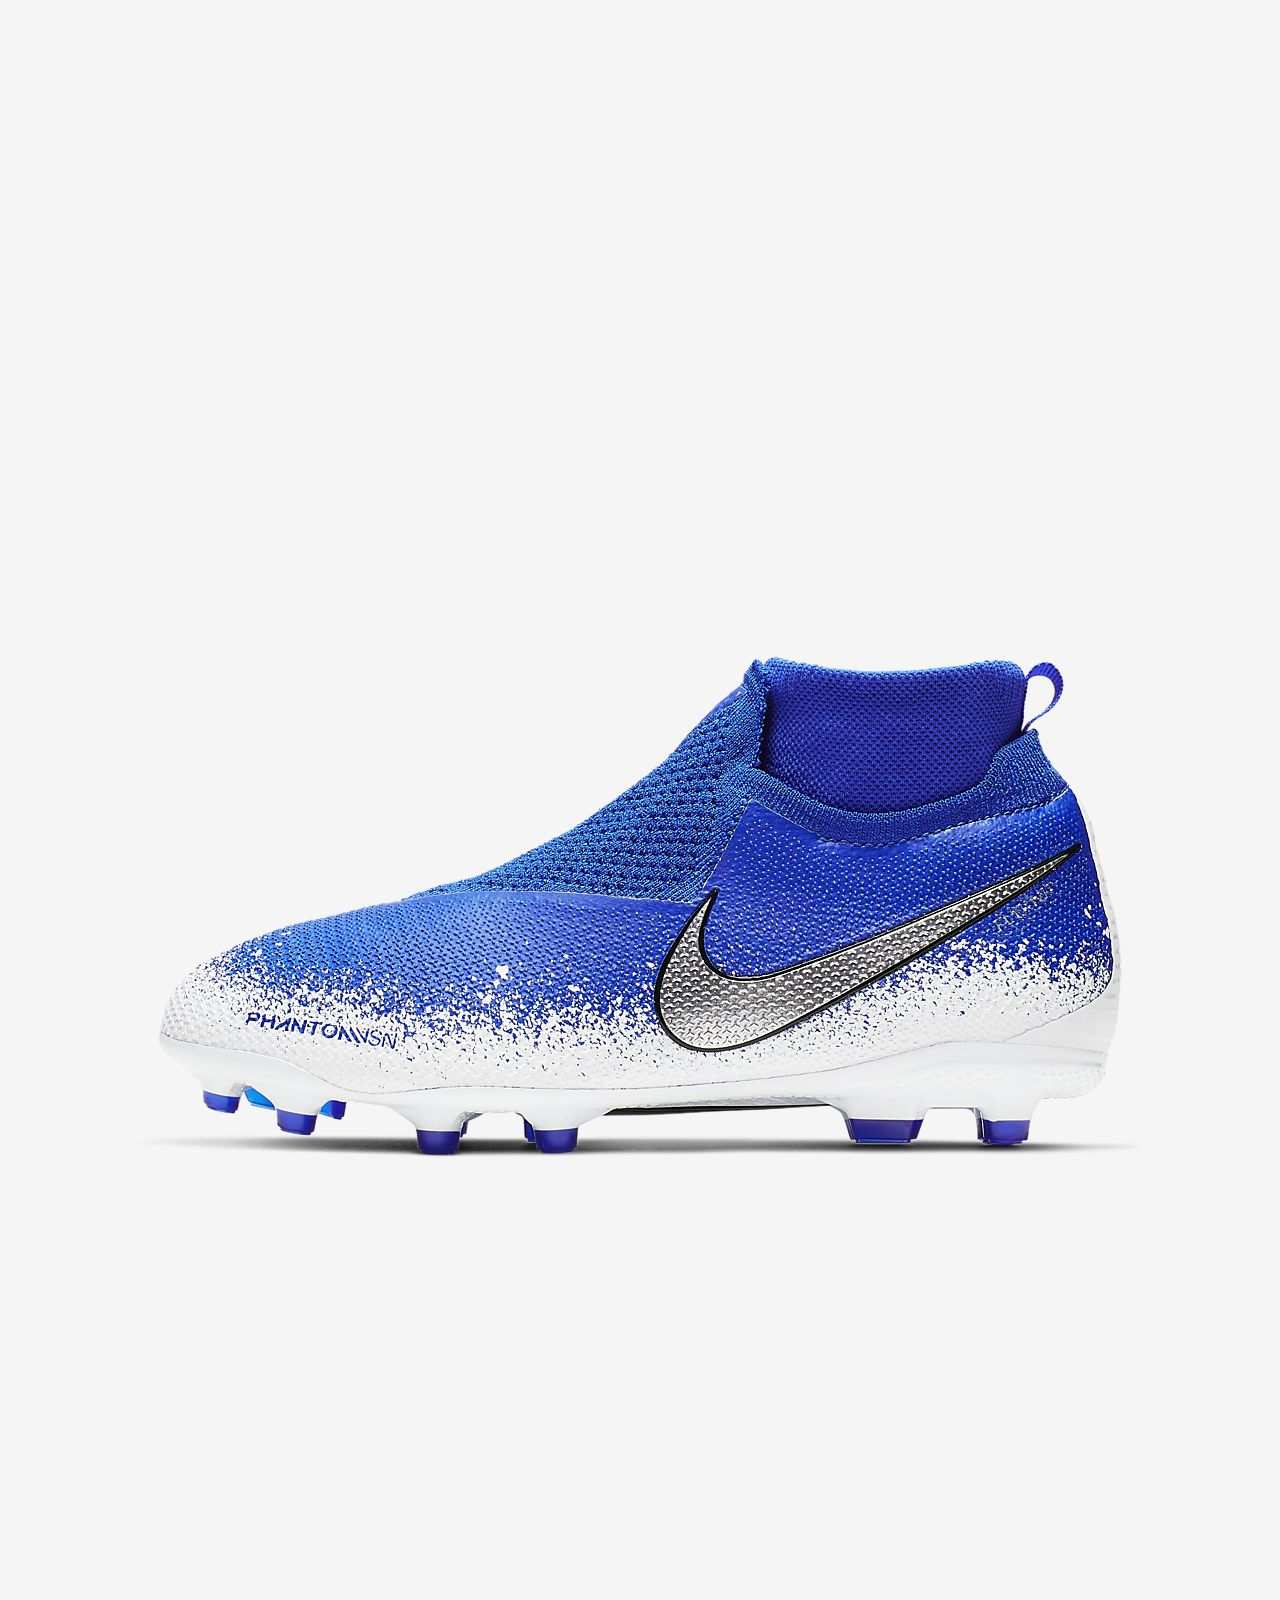 Футбольные бутсы для игры на разных покрытиях для школьников Nike Jr. Phantom Vision Elite Dynamic Fit MG